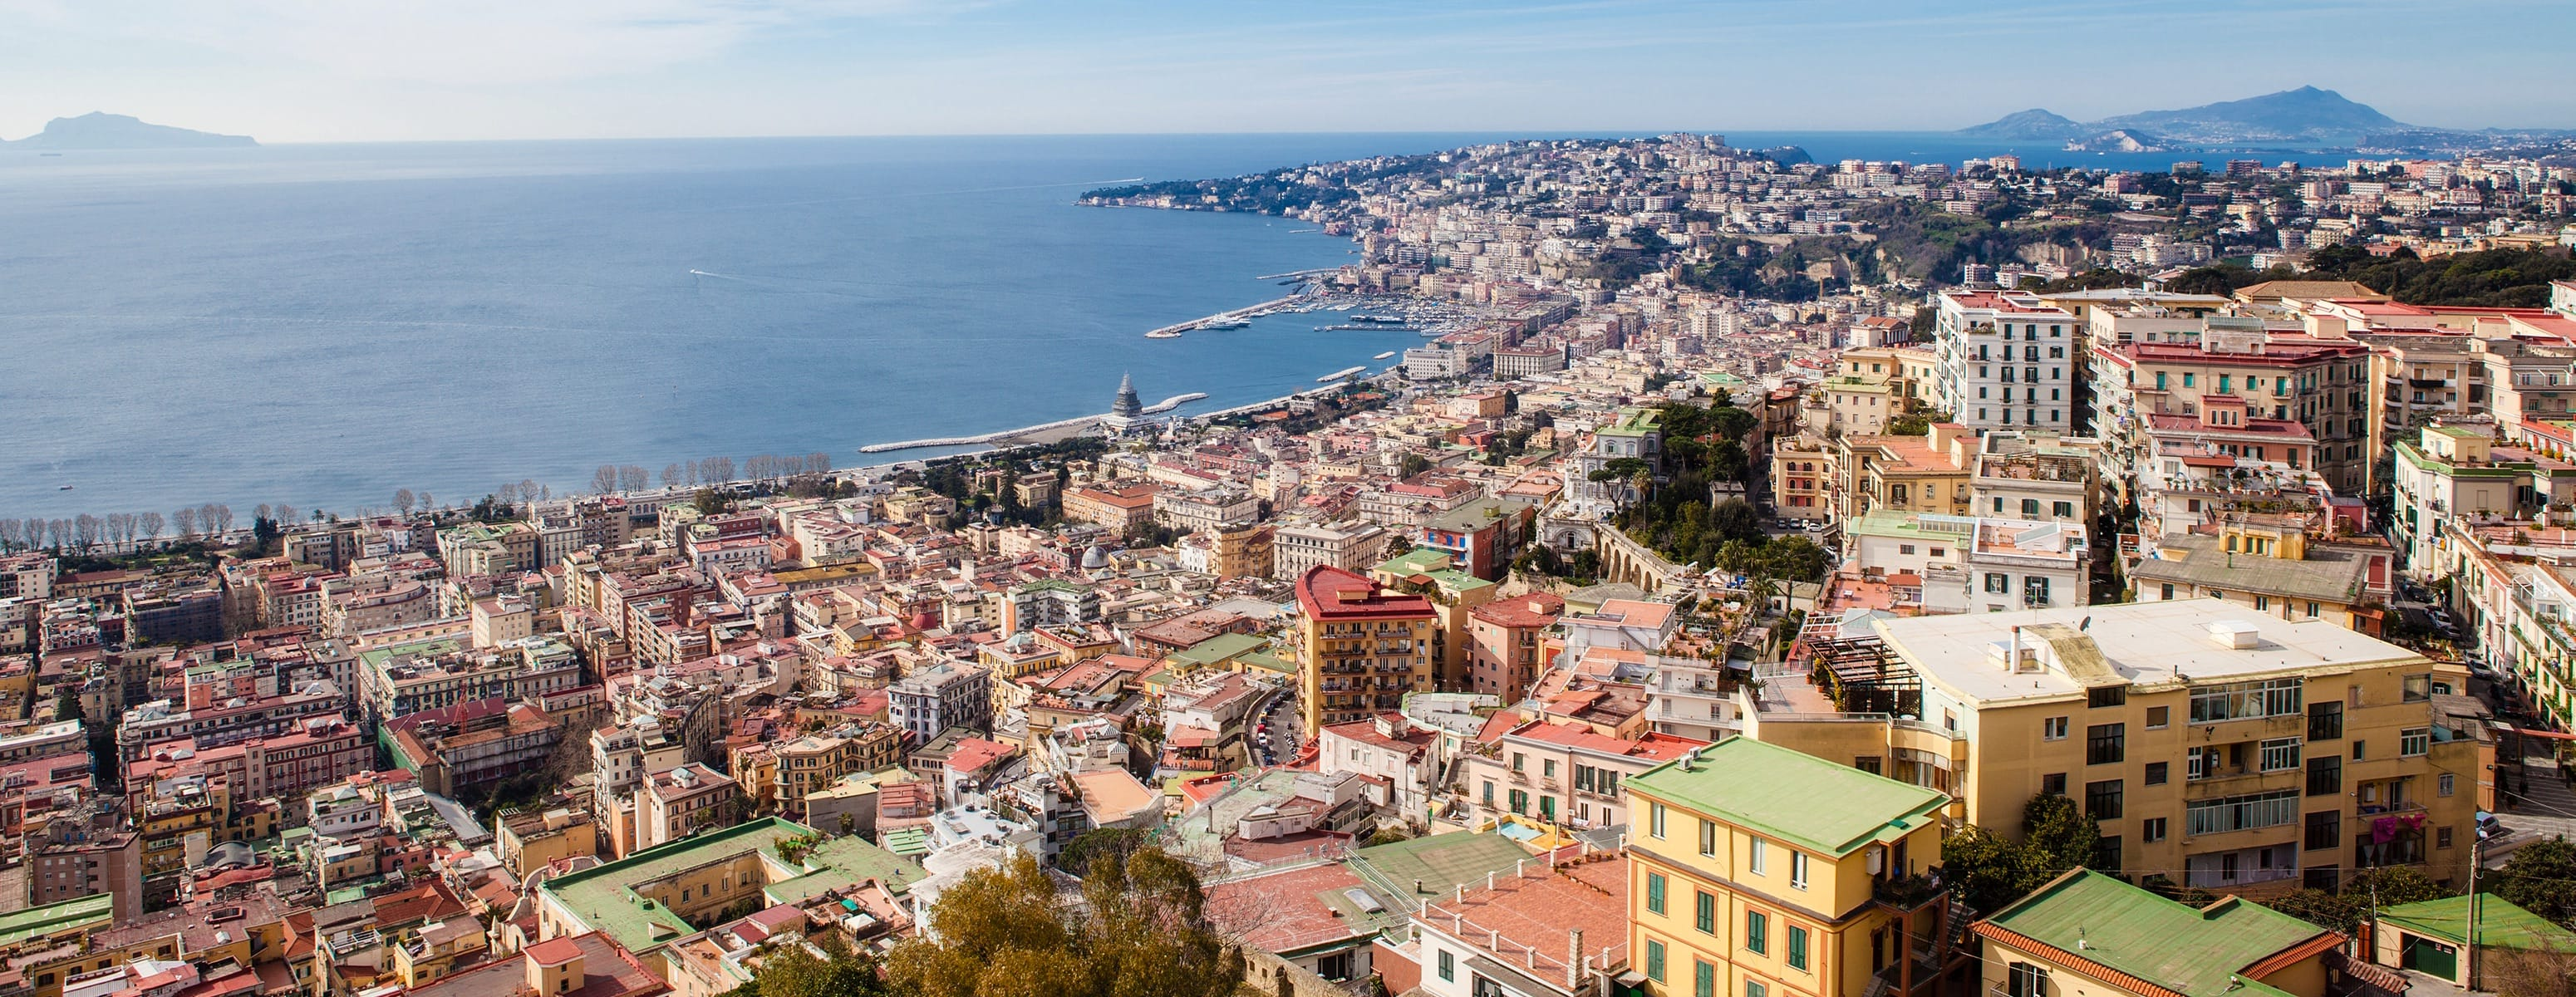 Metropolitan City of Naples的度假屋